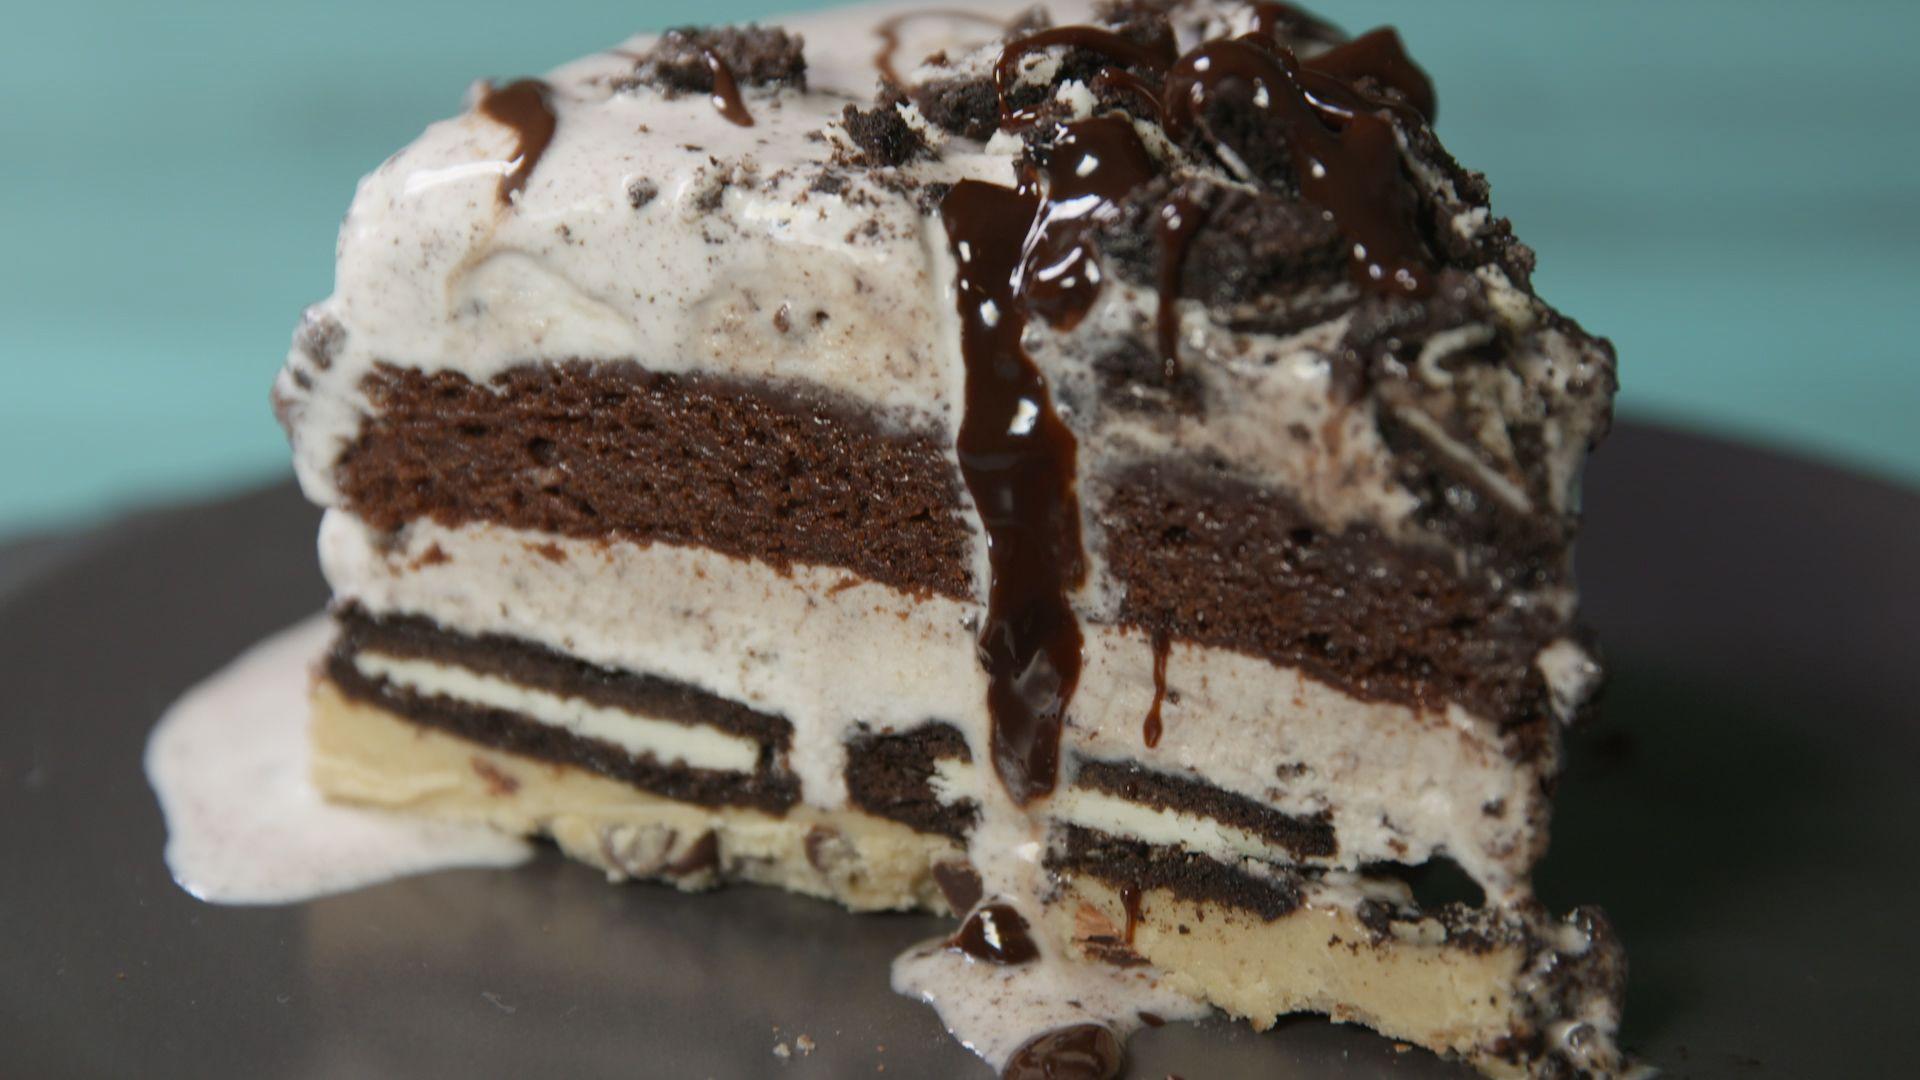 Best slutty brownie ice cream cake recipe how to make slutty best slutty brownie ice cream cake recipe how to make slutty brownie ice cream cake ccuart Gallery